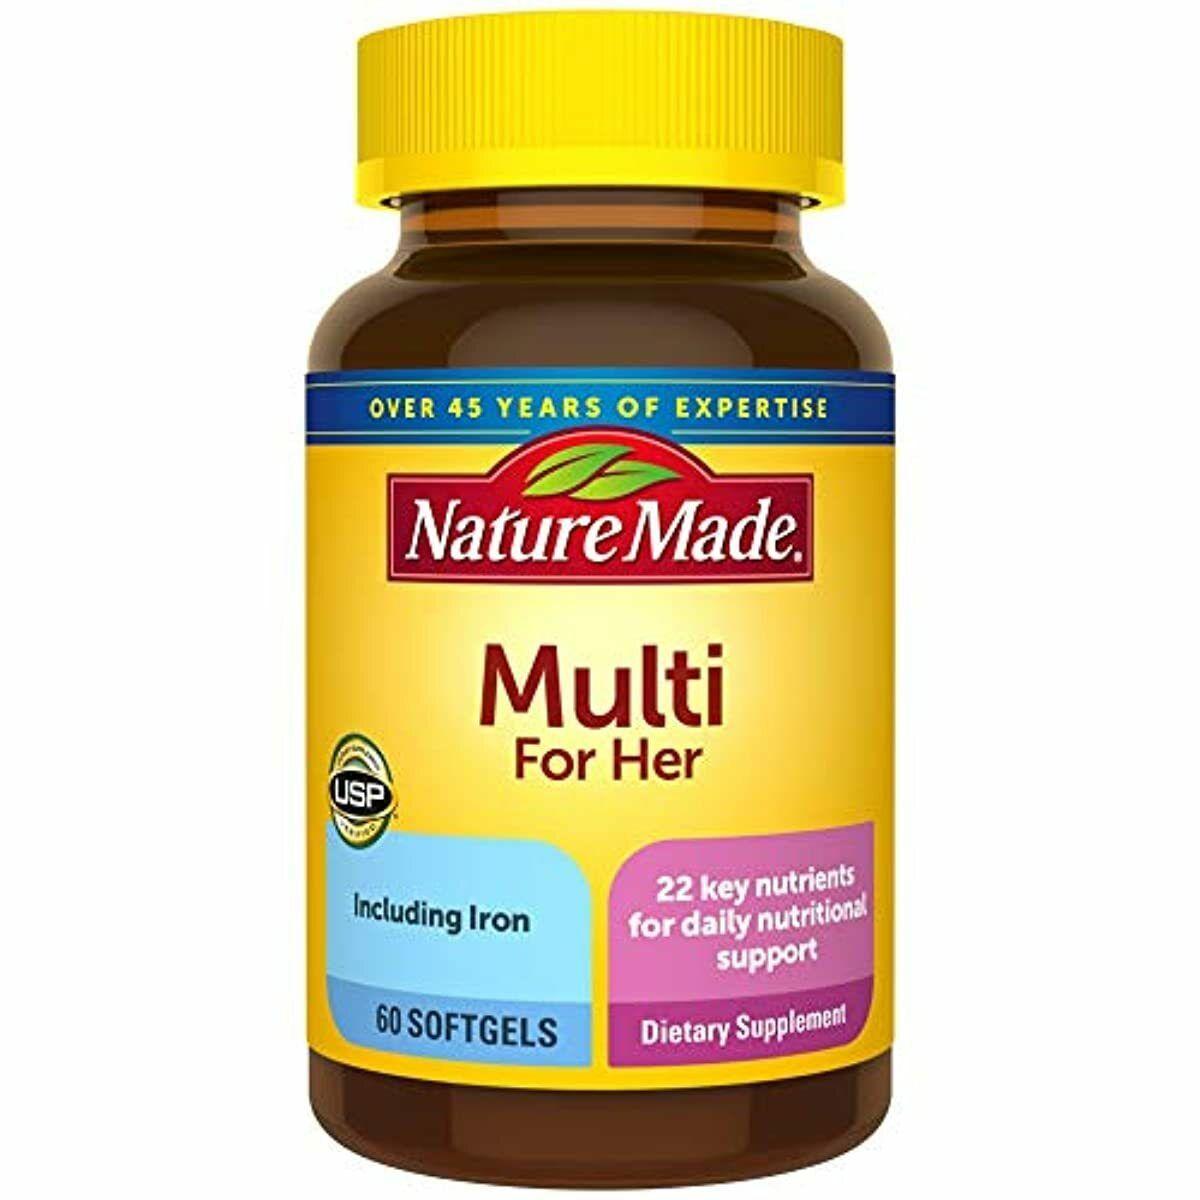 Nature Made Multi For Her Dietary Softgels Original Formula